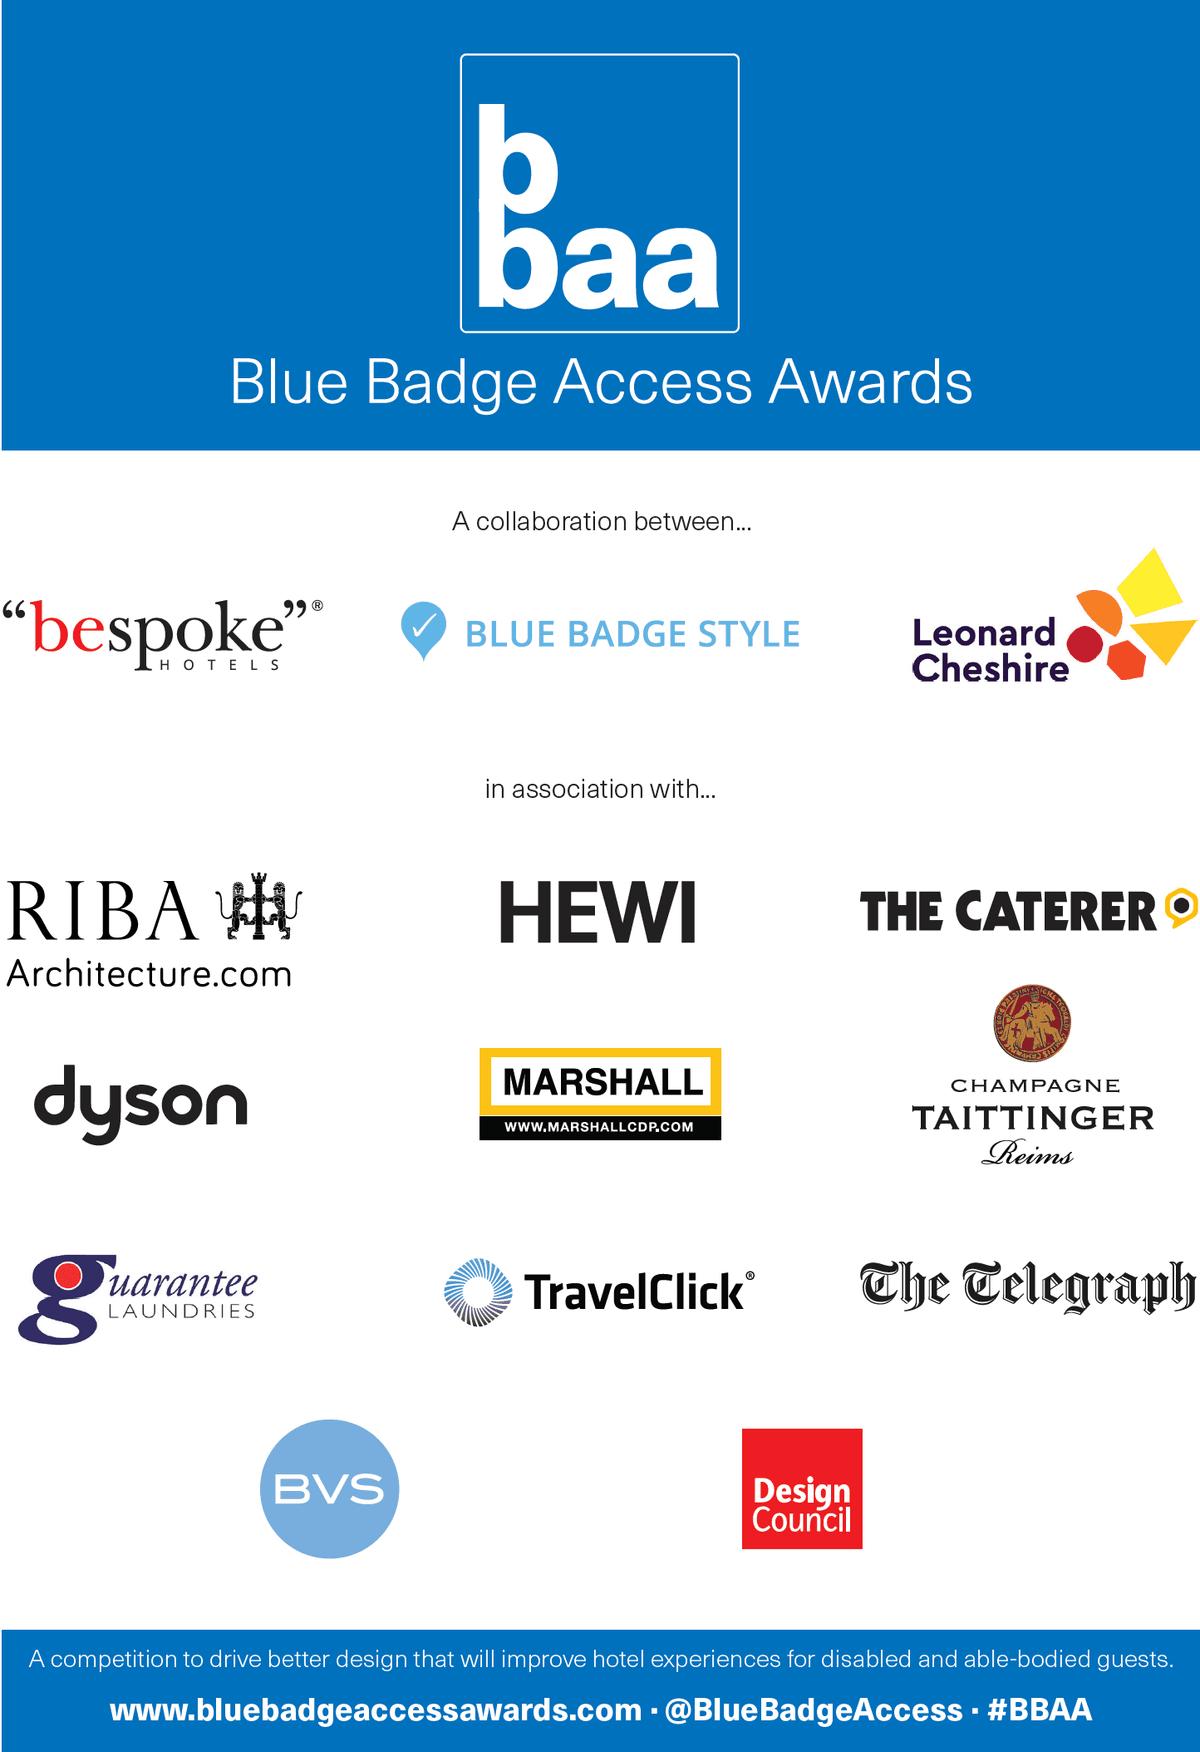 Blue Badge Access Awards 2019